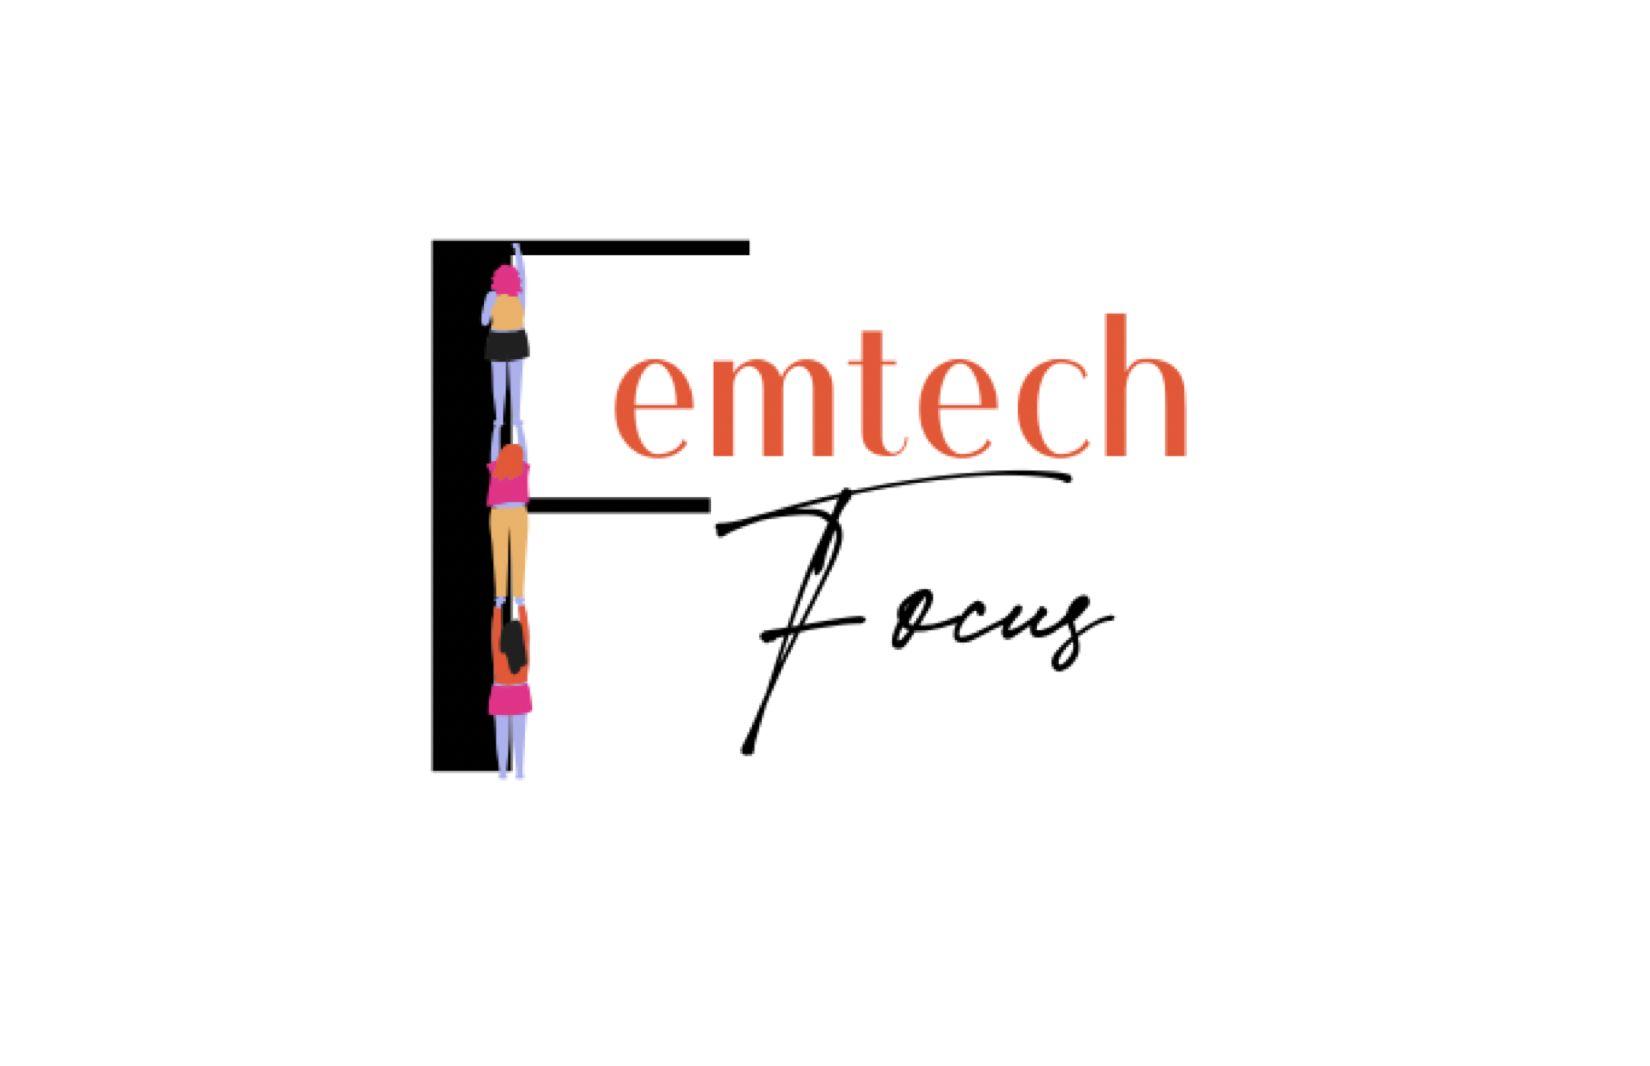 FemTech Focus - Viva La Vulva with Dr. Lyndsey Harper from Rosy -Episode 3